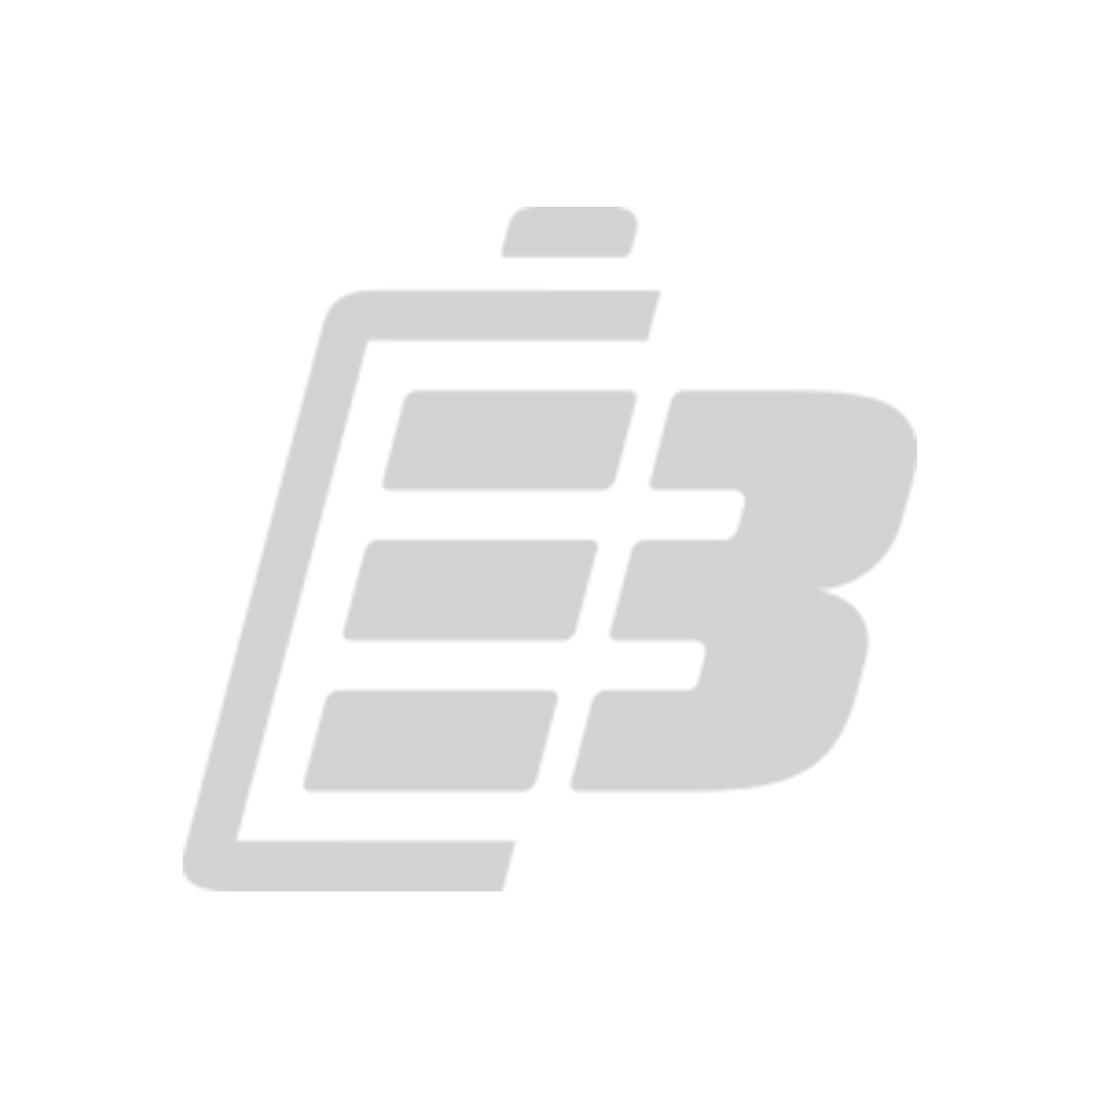 Smartphone battery Vodafone Smart Speed 6_1